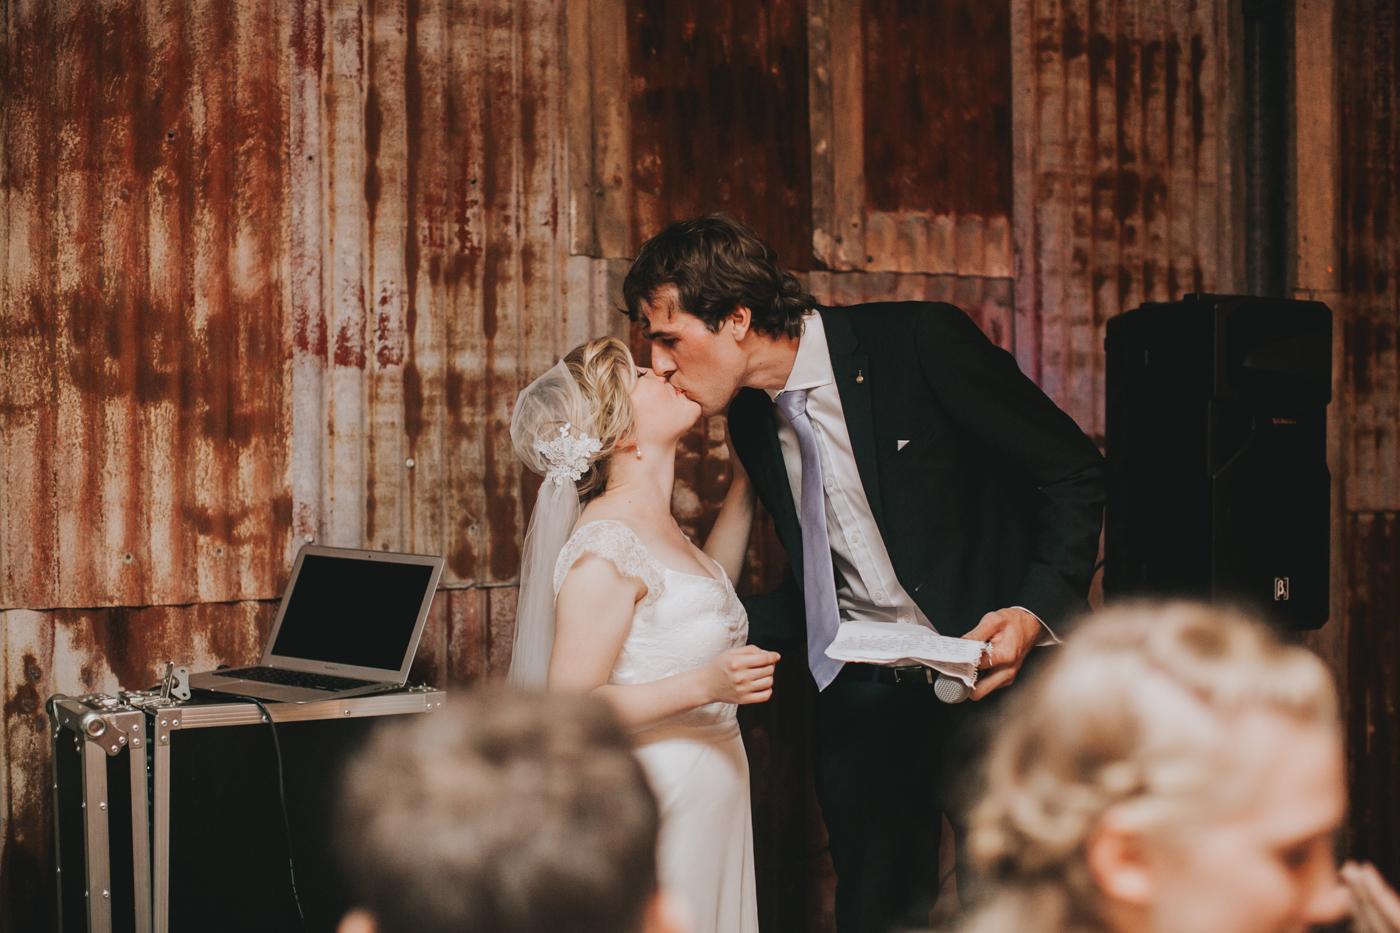 Rachel & Jacob - Willow Farm Berry - South Coast Wedding - Samantha Heather Photography-202.jpg